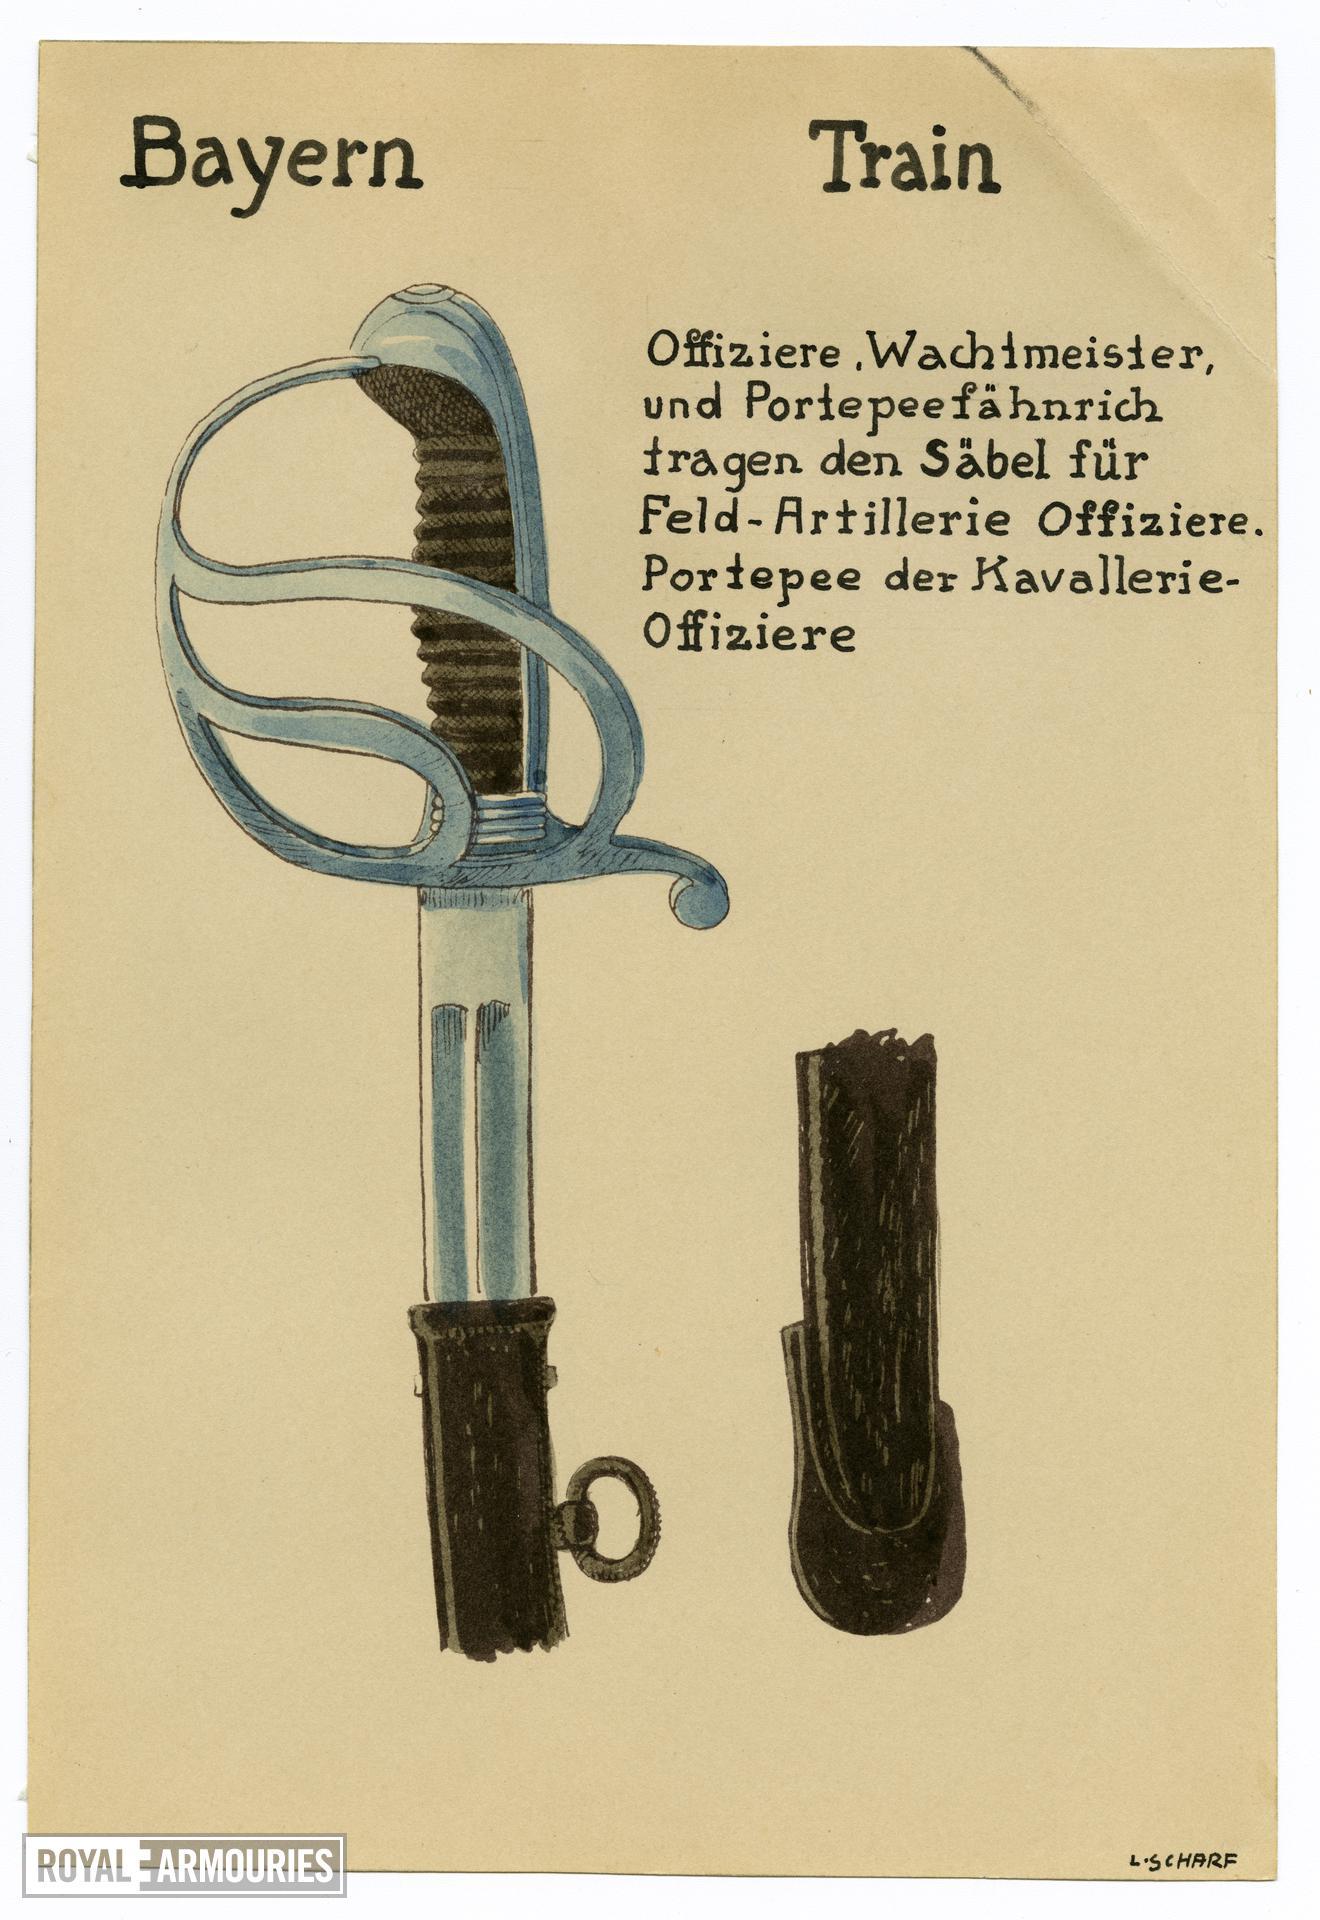 2/7 coloured drawings of German military swords.